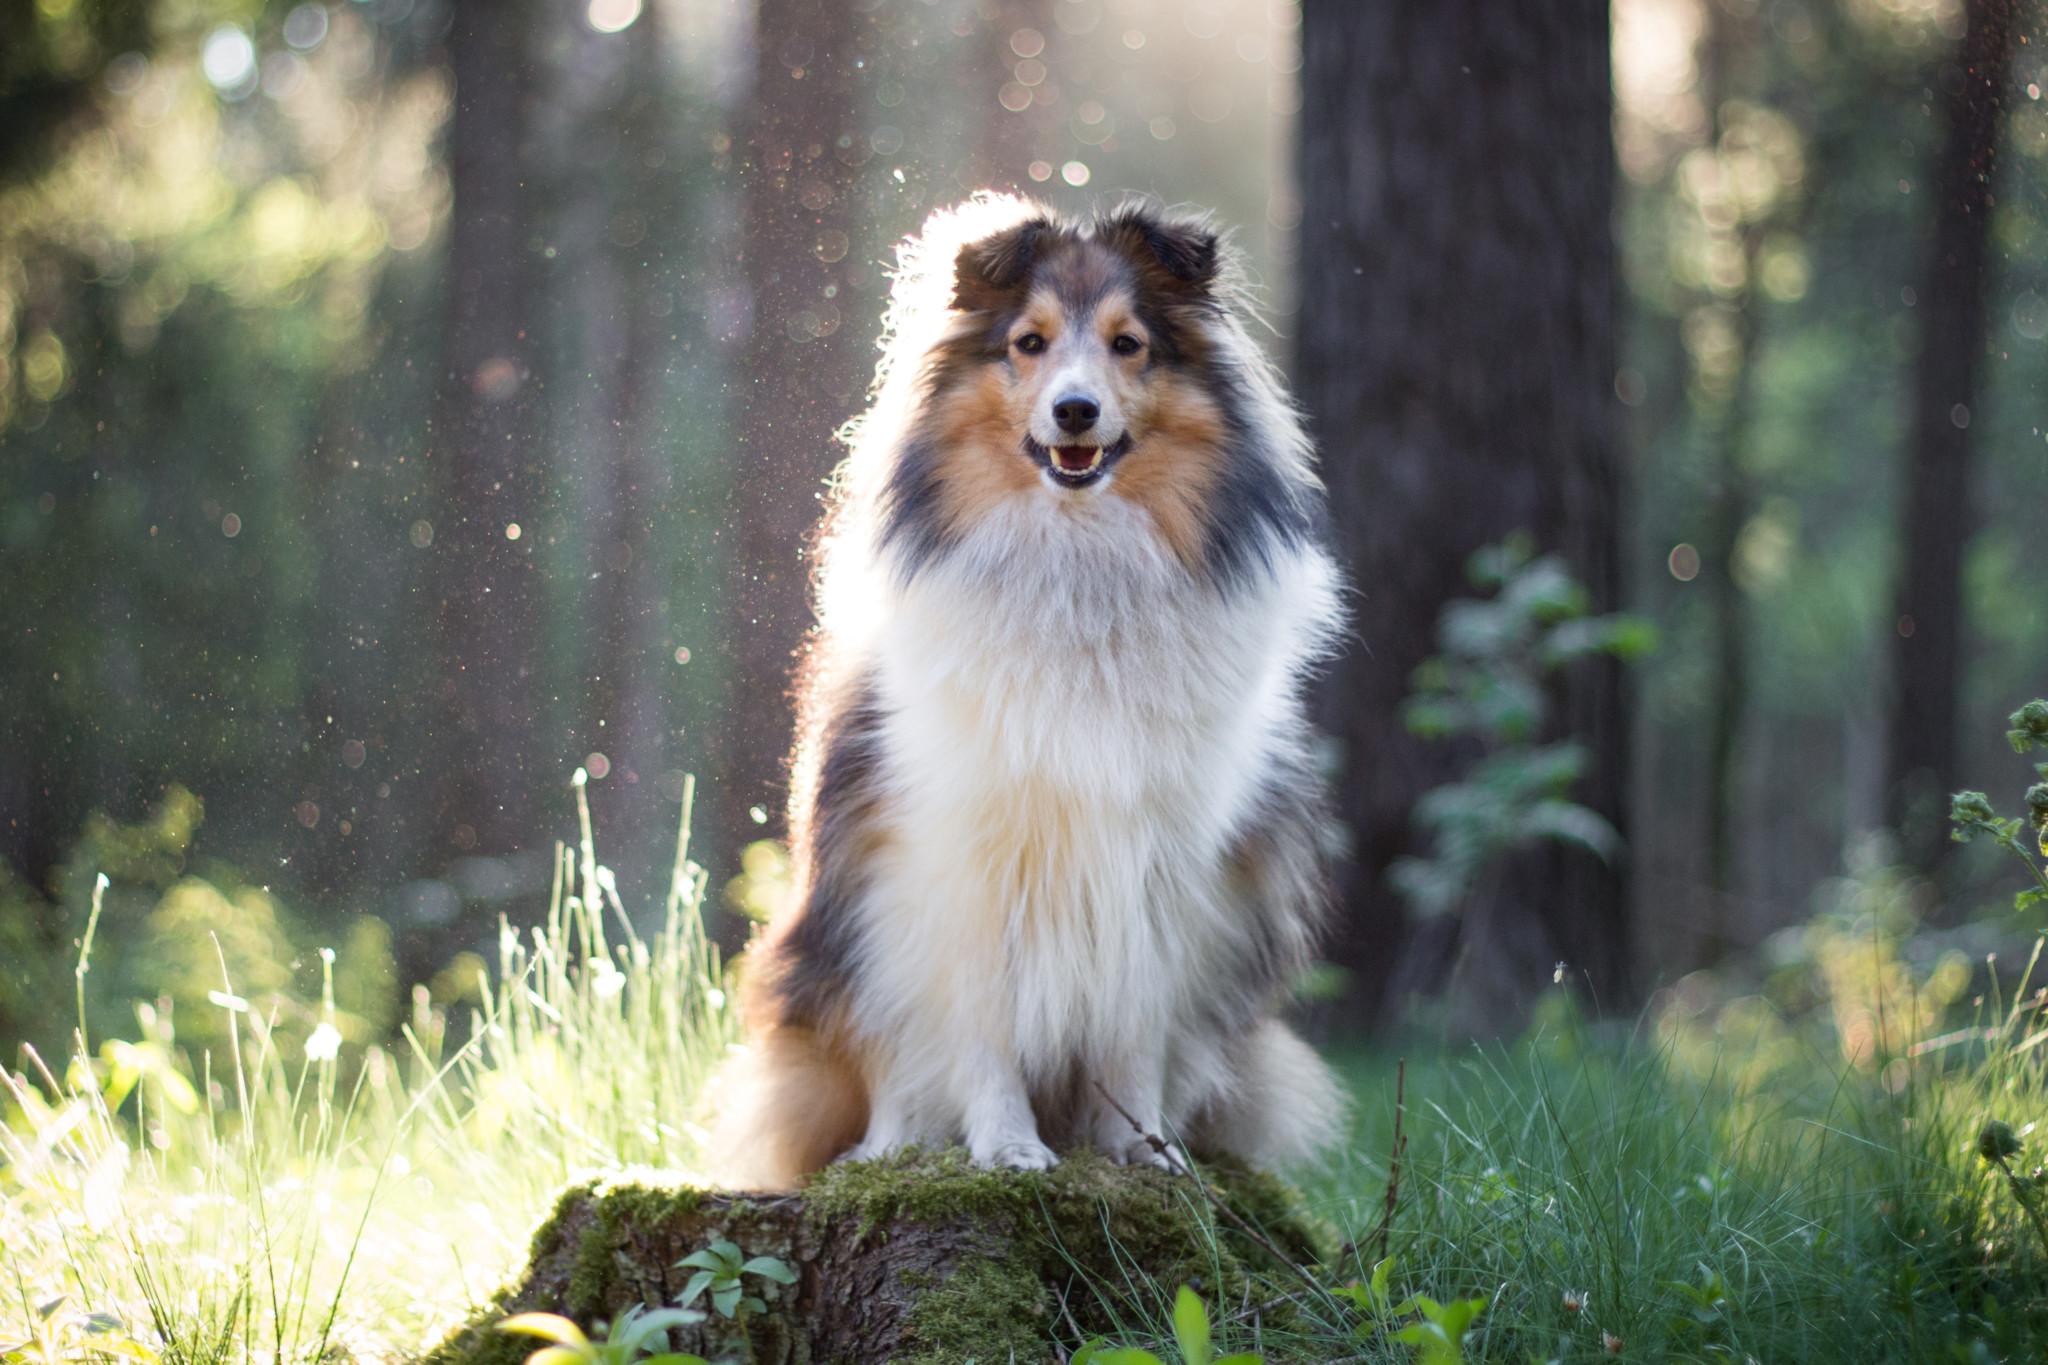 Objektiv Fotografie Hund